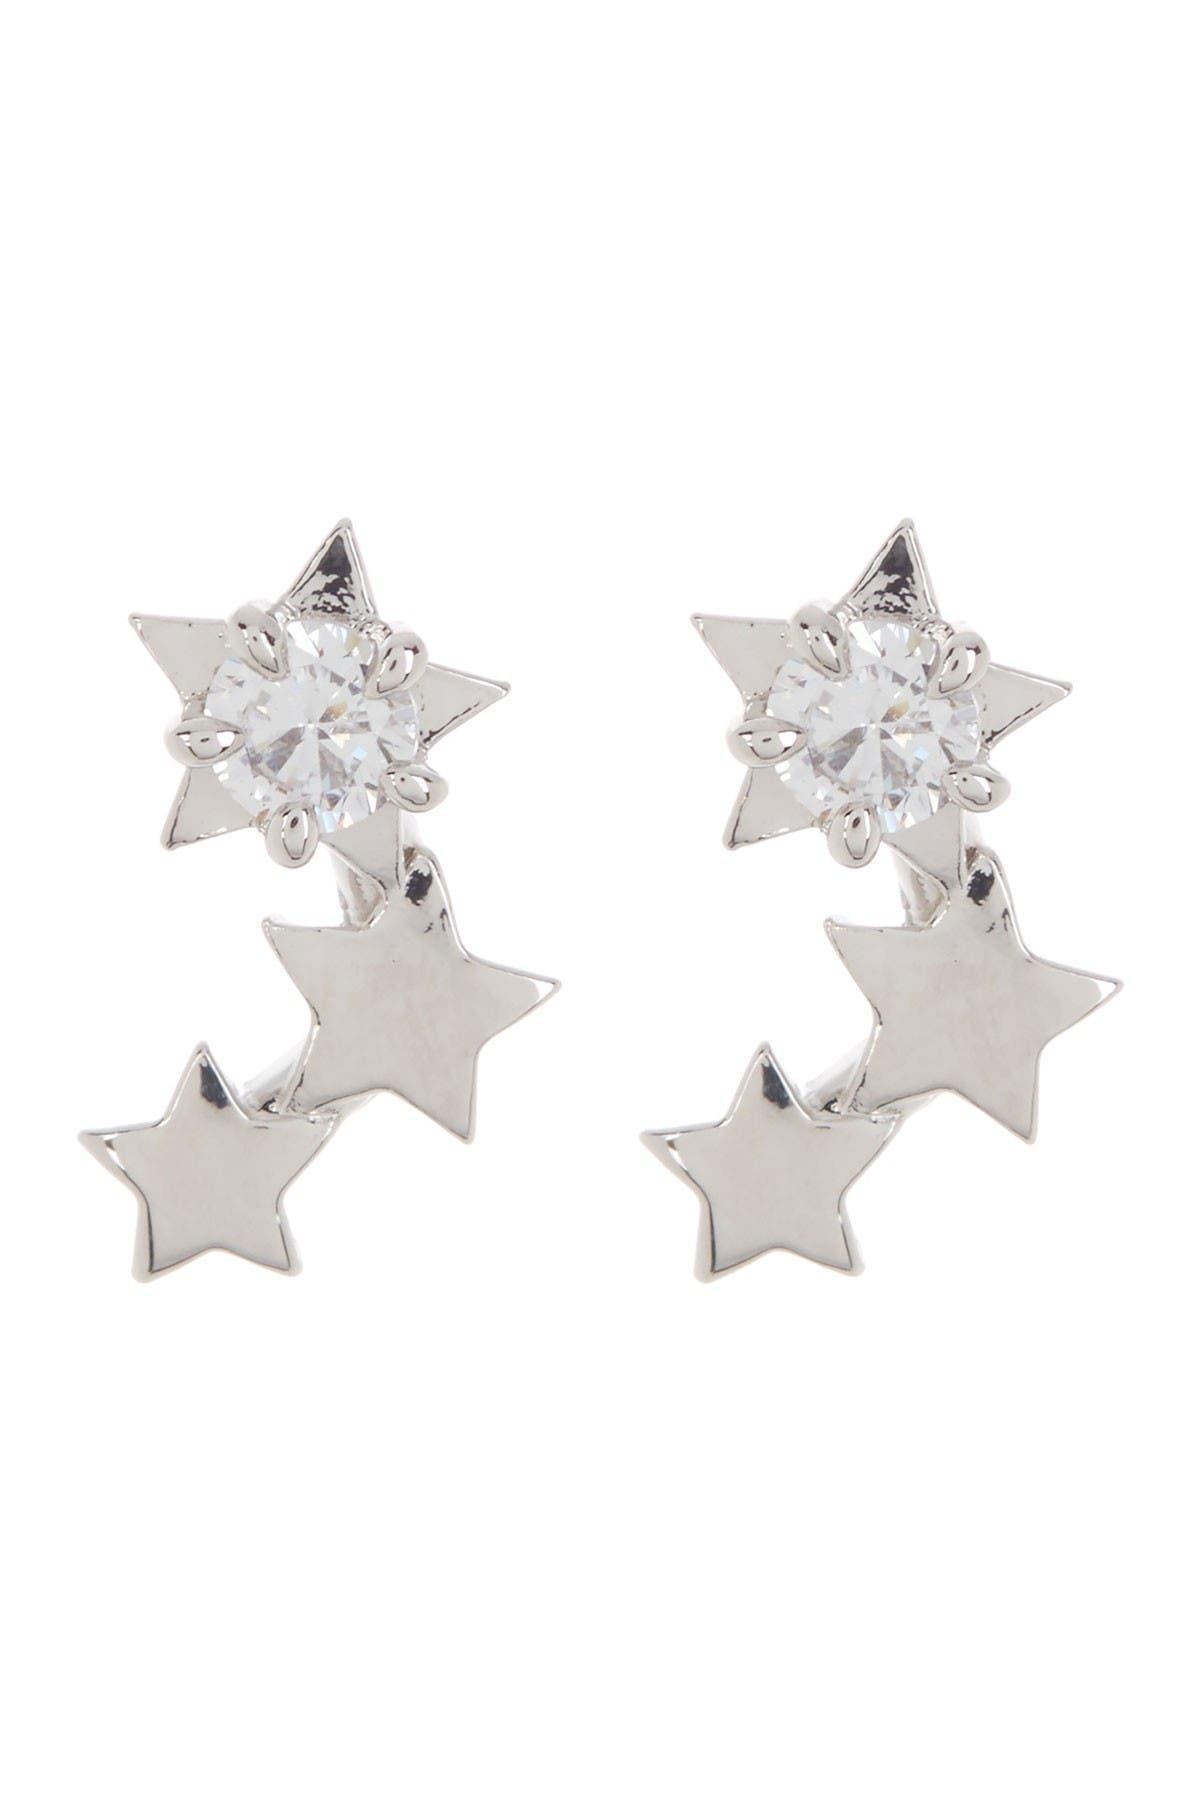 Image of NADRI Rhodium Plated Prong Set CZ Cluster Star Stud Earrings